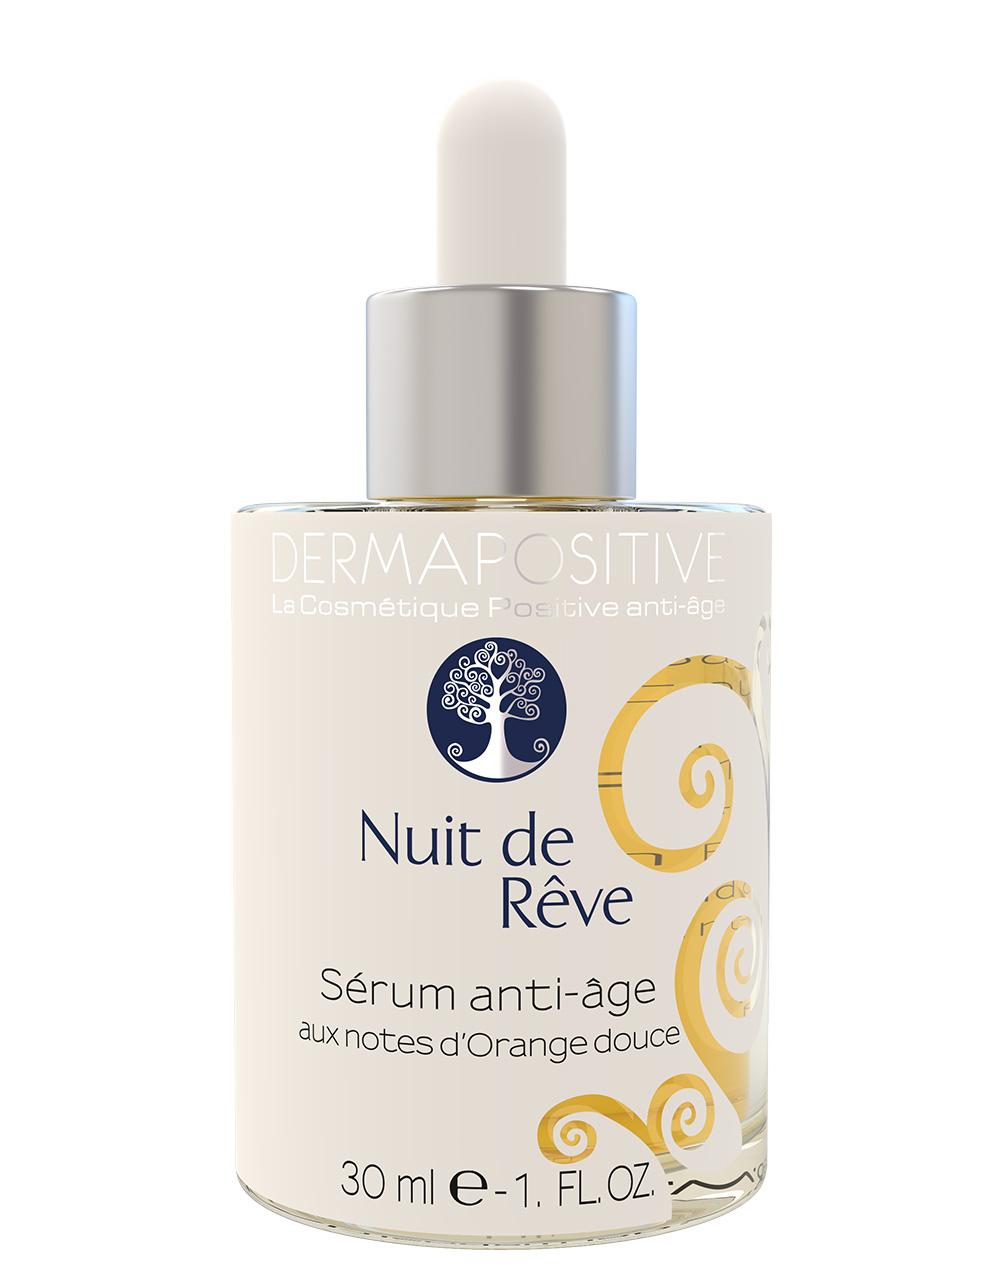 Dermapositive_Nuit_de_Reve_serum_antiage